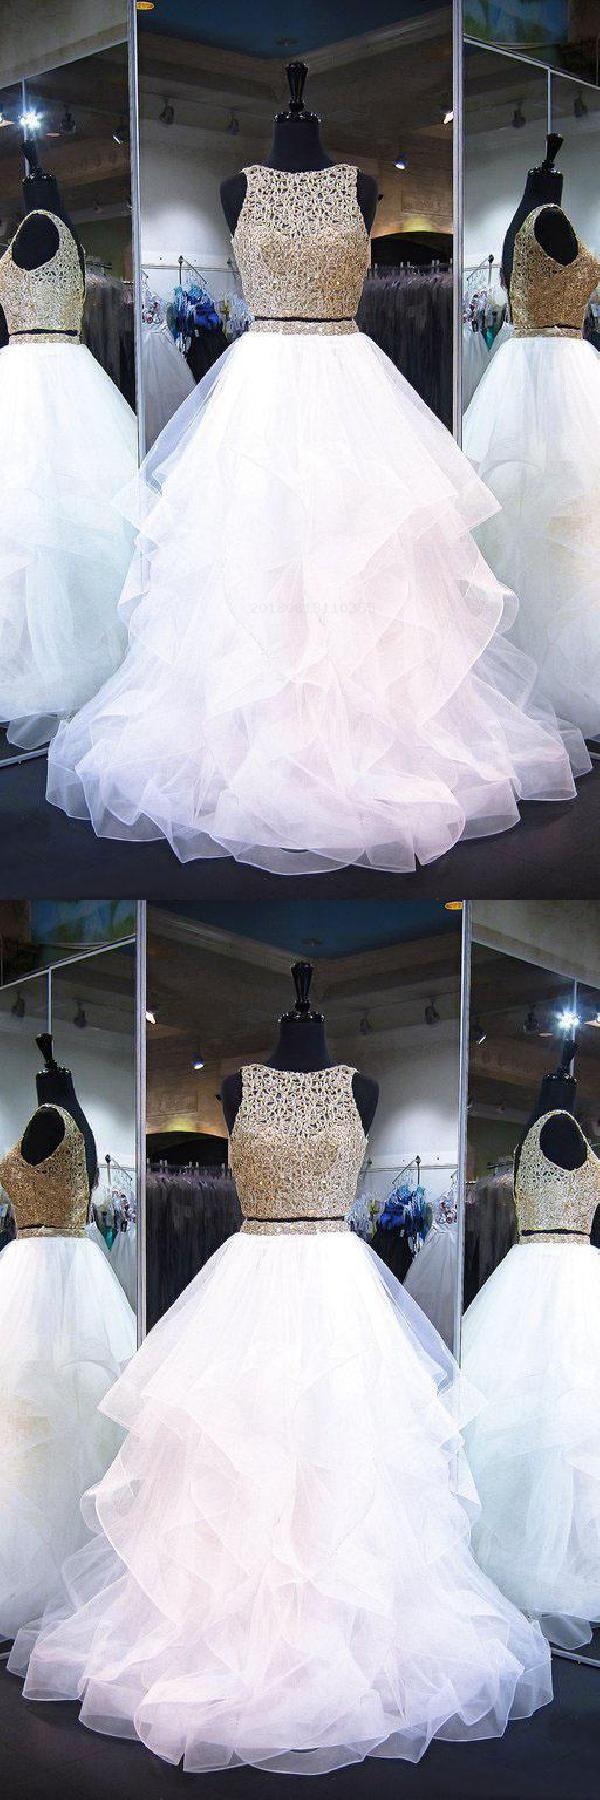 Sleeveless prom dresses prom dresses long prom dresses two piece